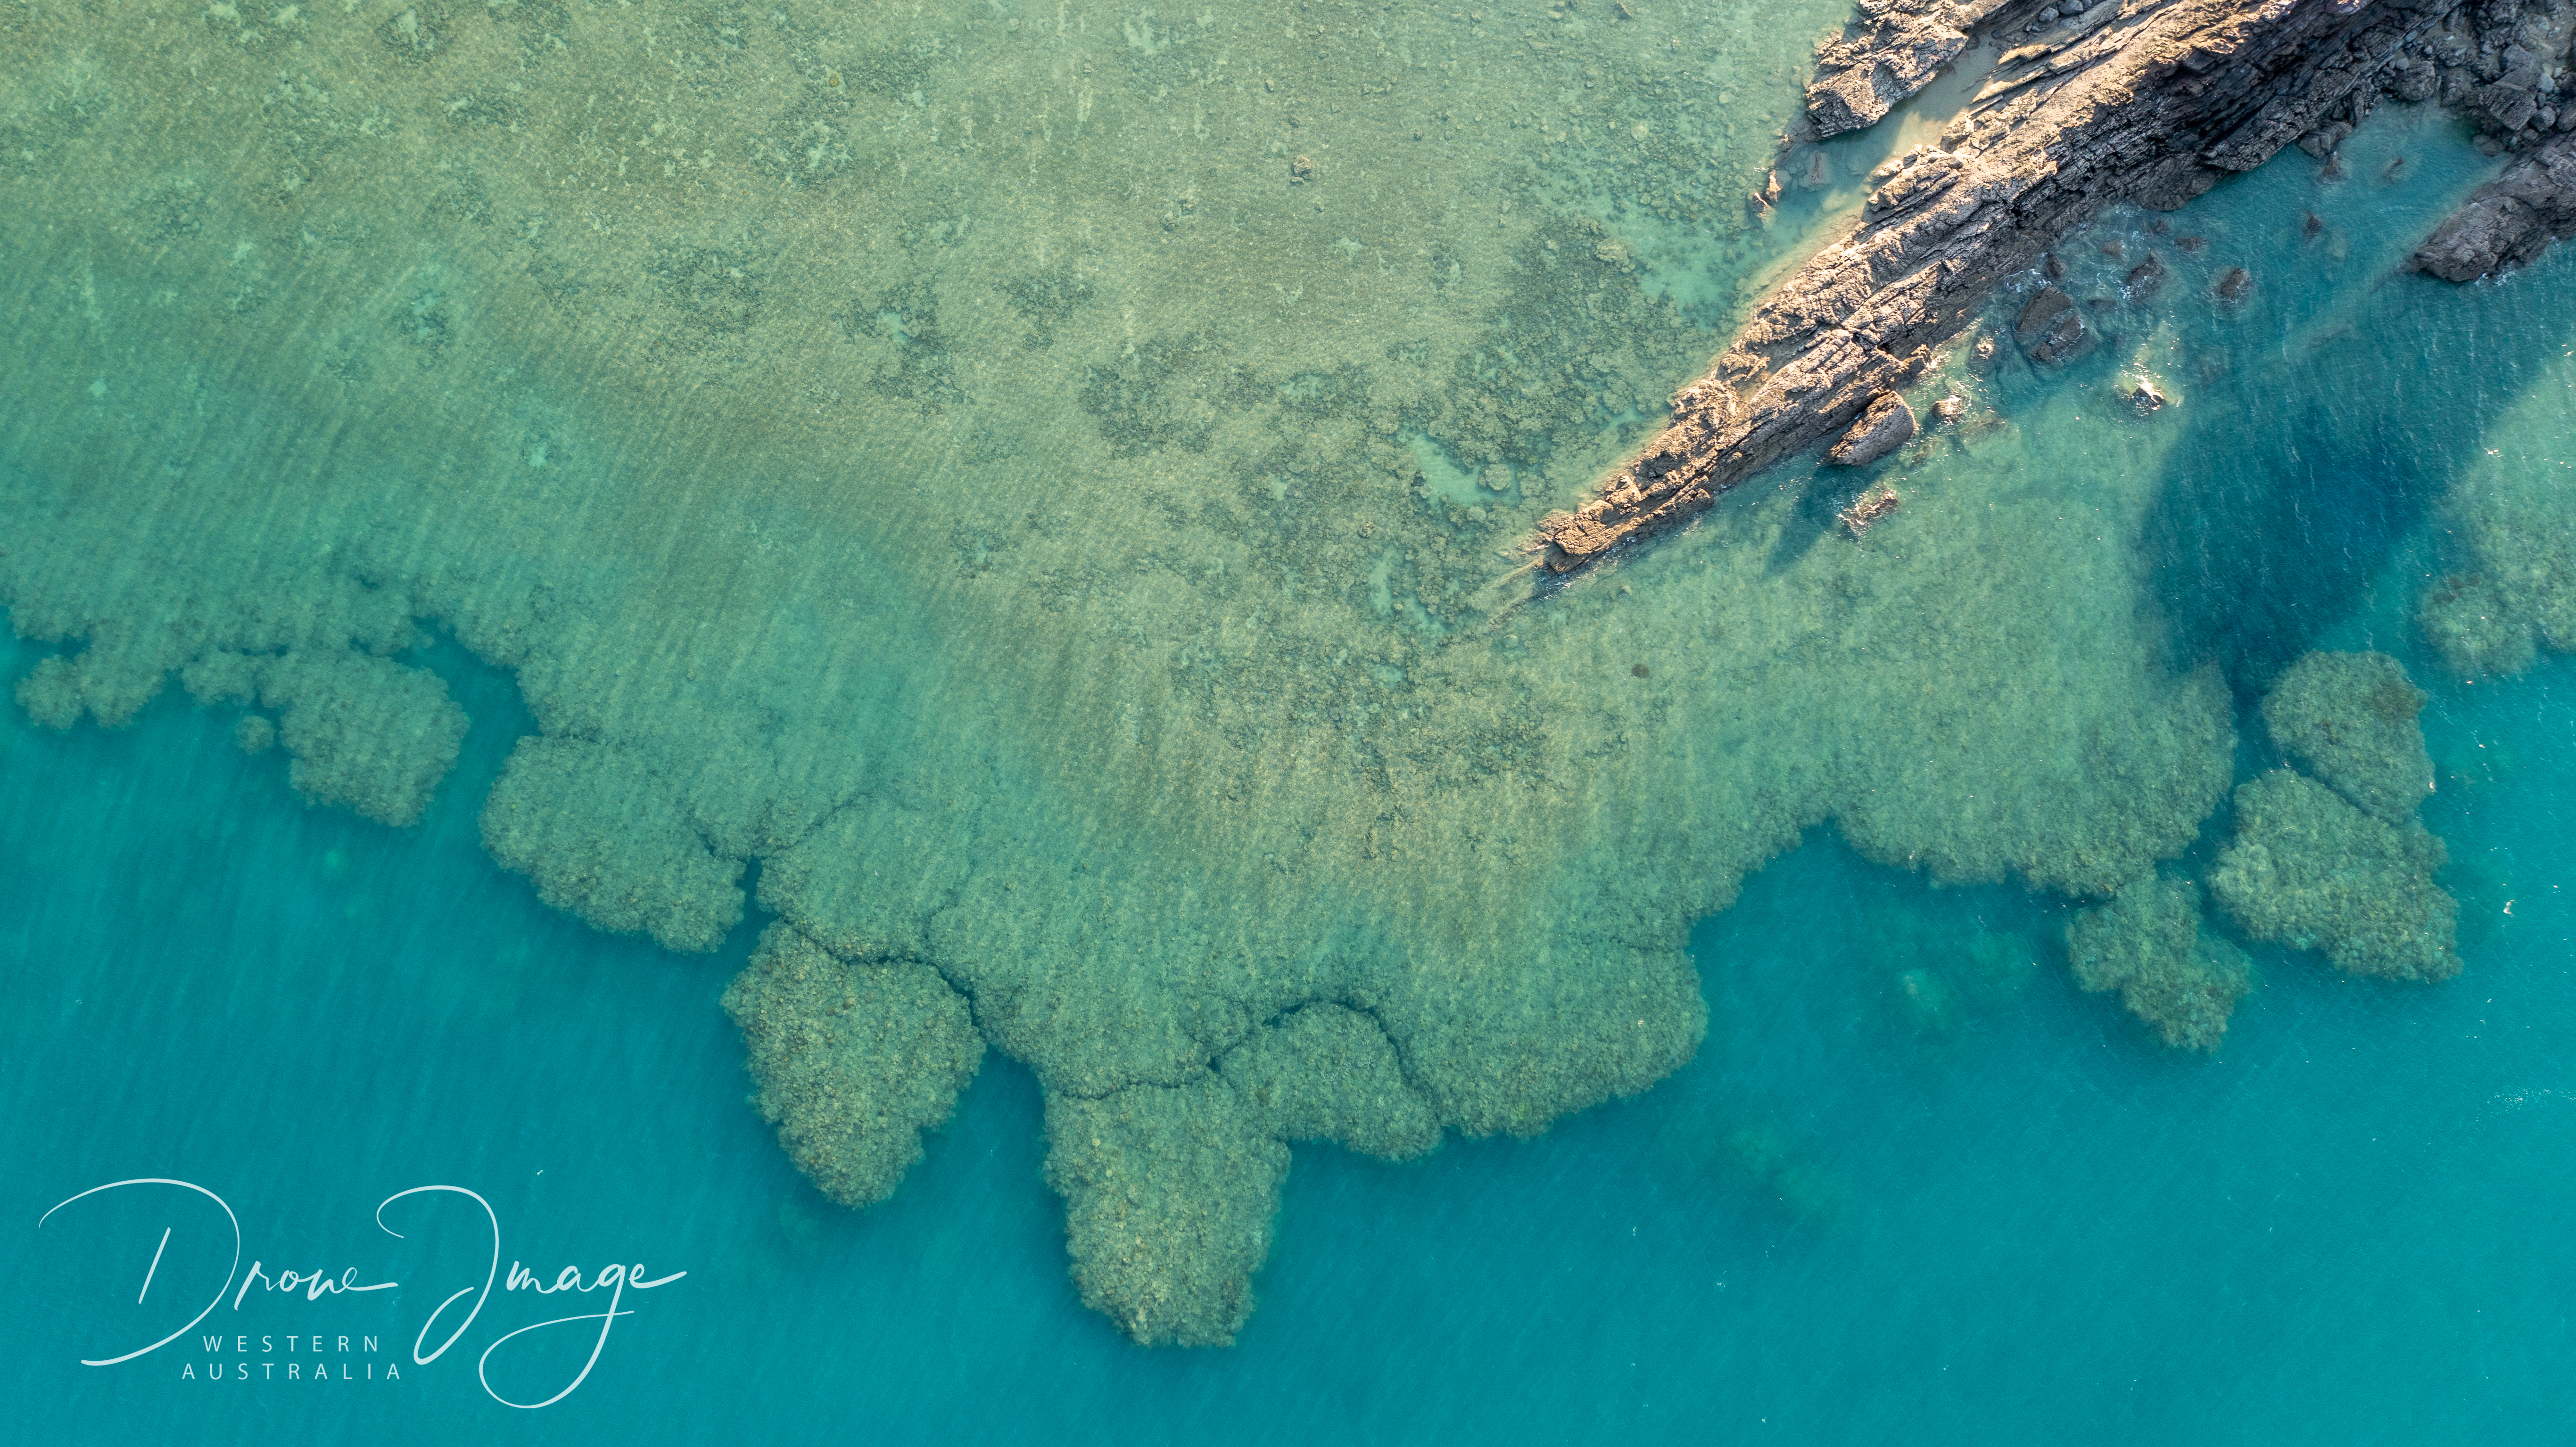 Cockatoo Island Drone Image Western Australia